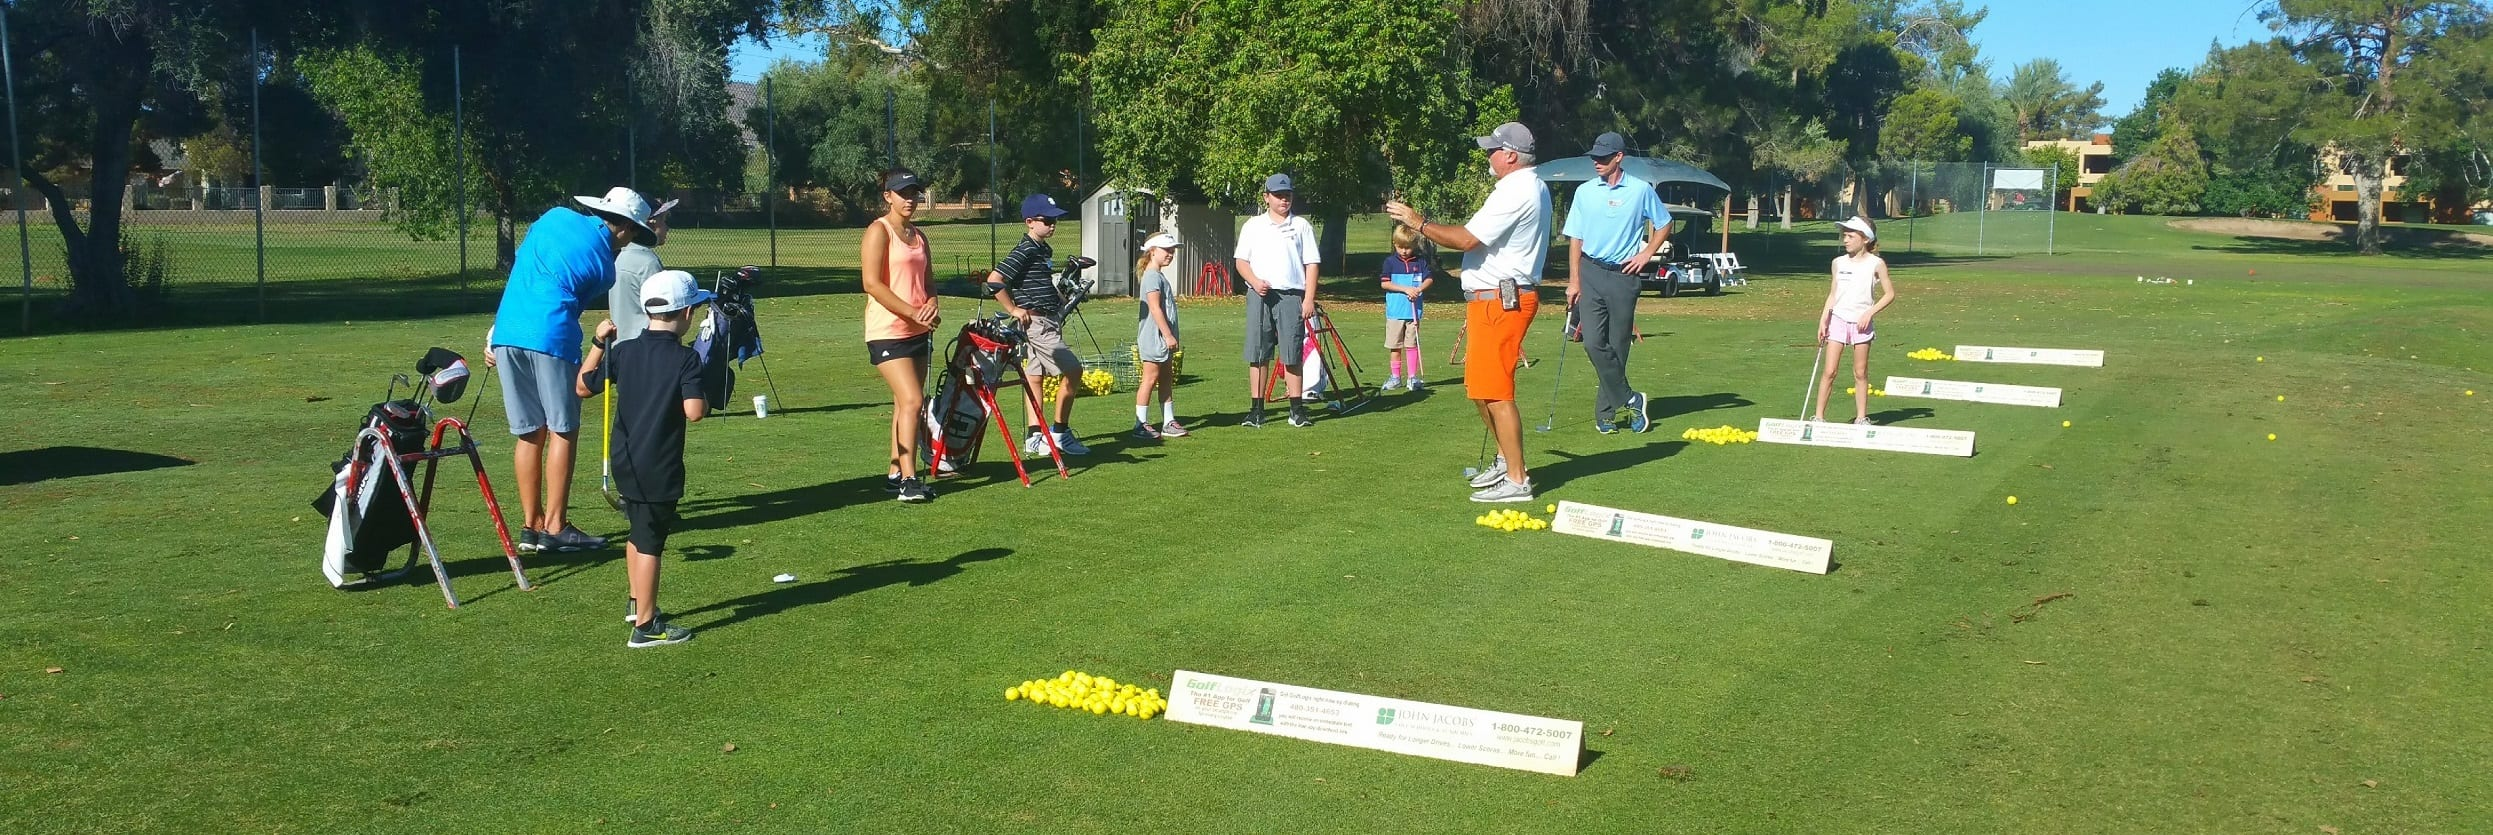 Junior Golfers at Orange Tree Golf Club